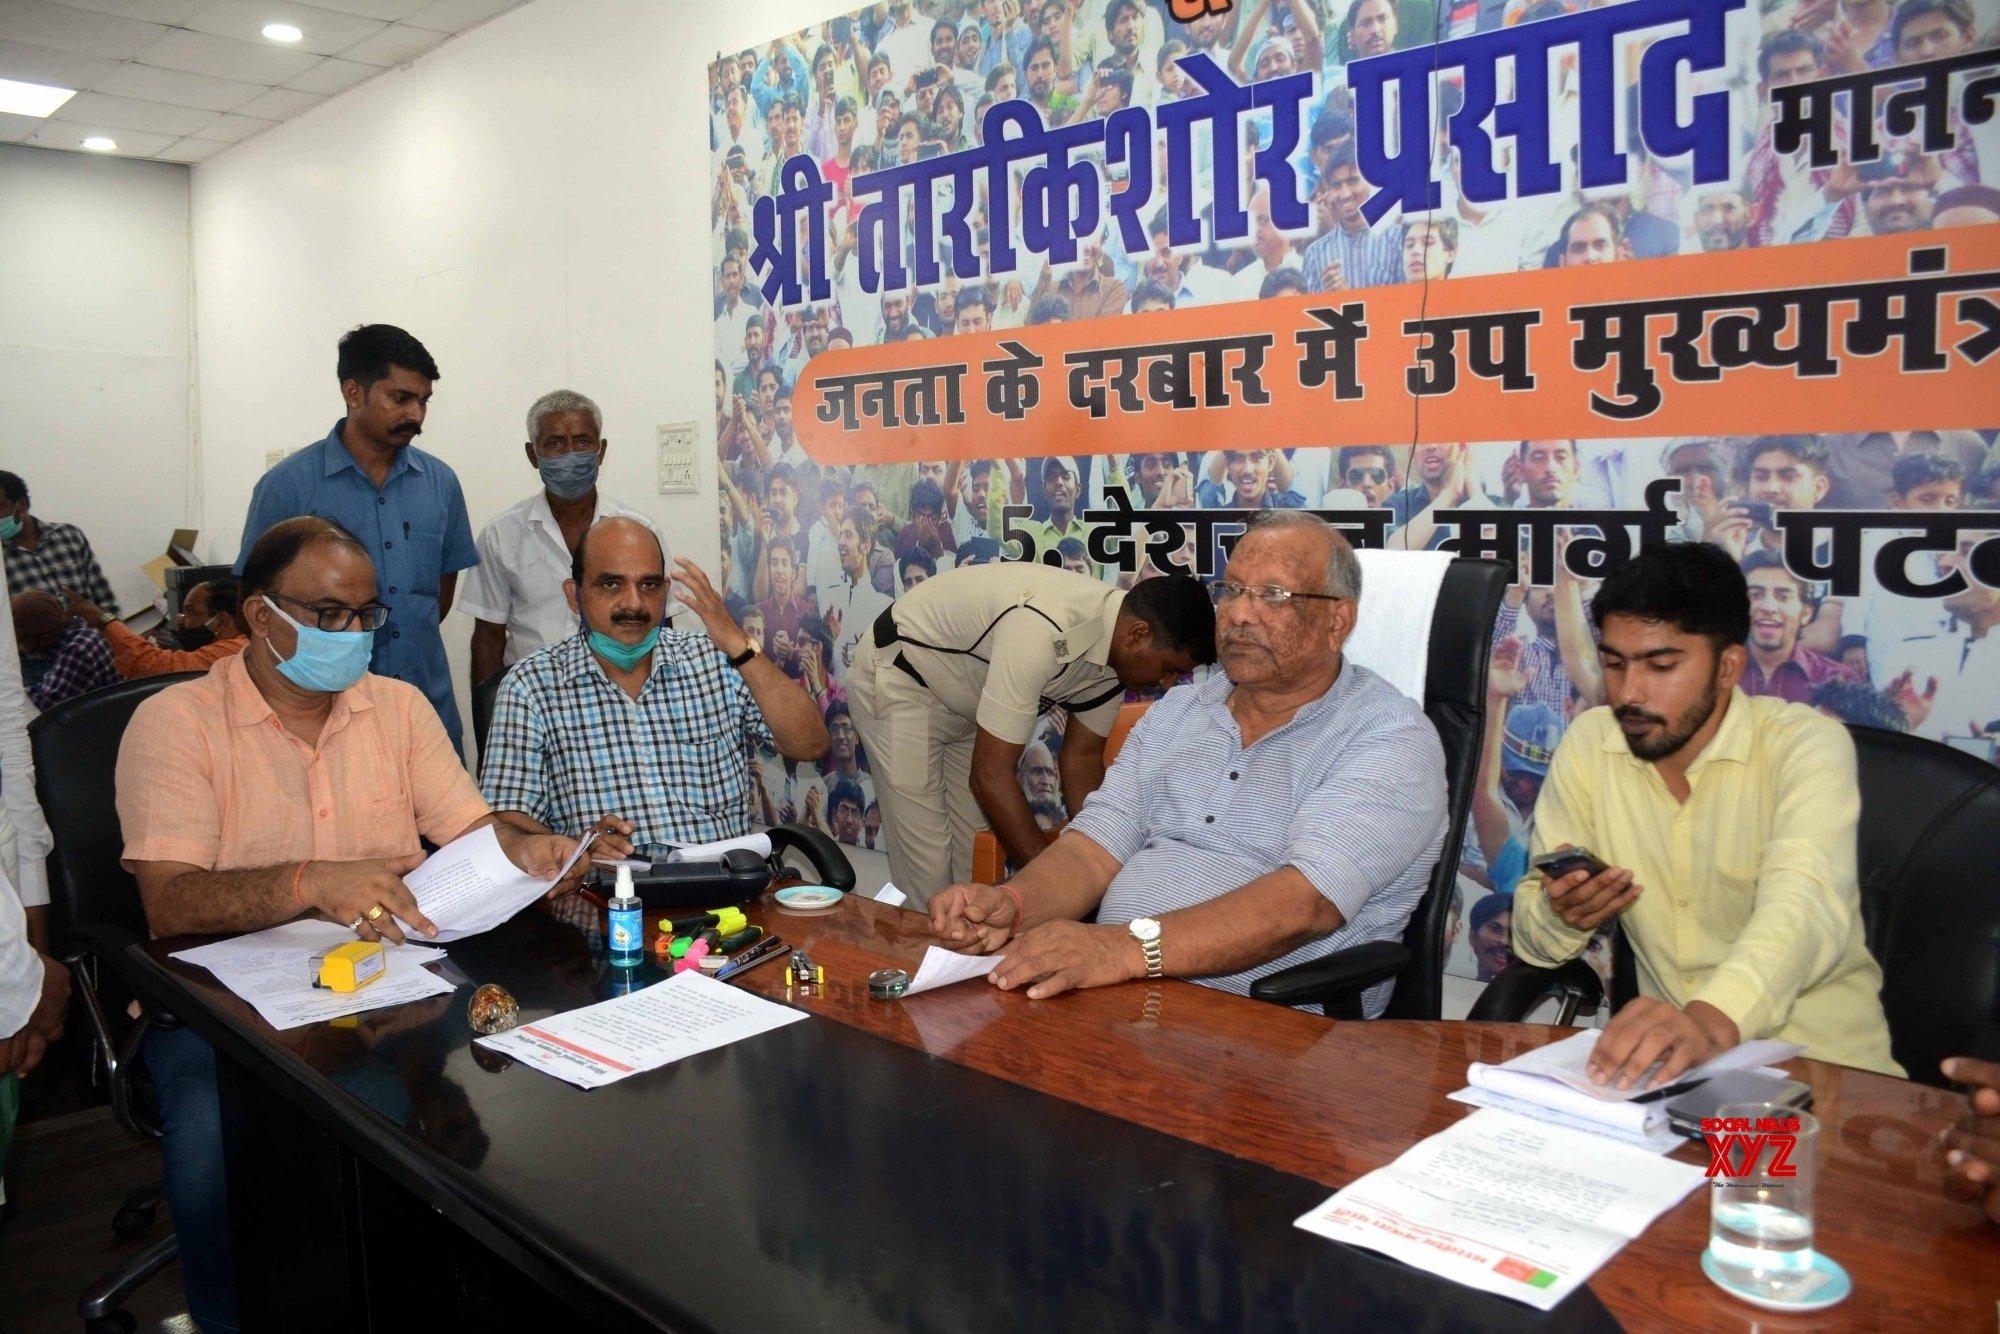 Patna: - BJP leader and Deputy Chief Minister Tarkishore Prasad - during the Janta Darbar in Patna #Gallery